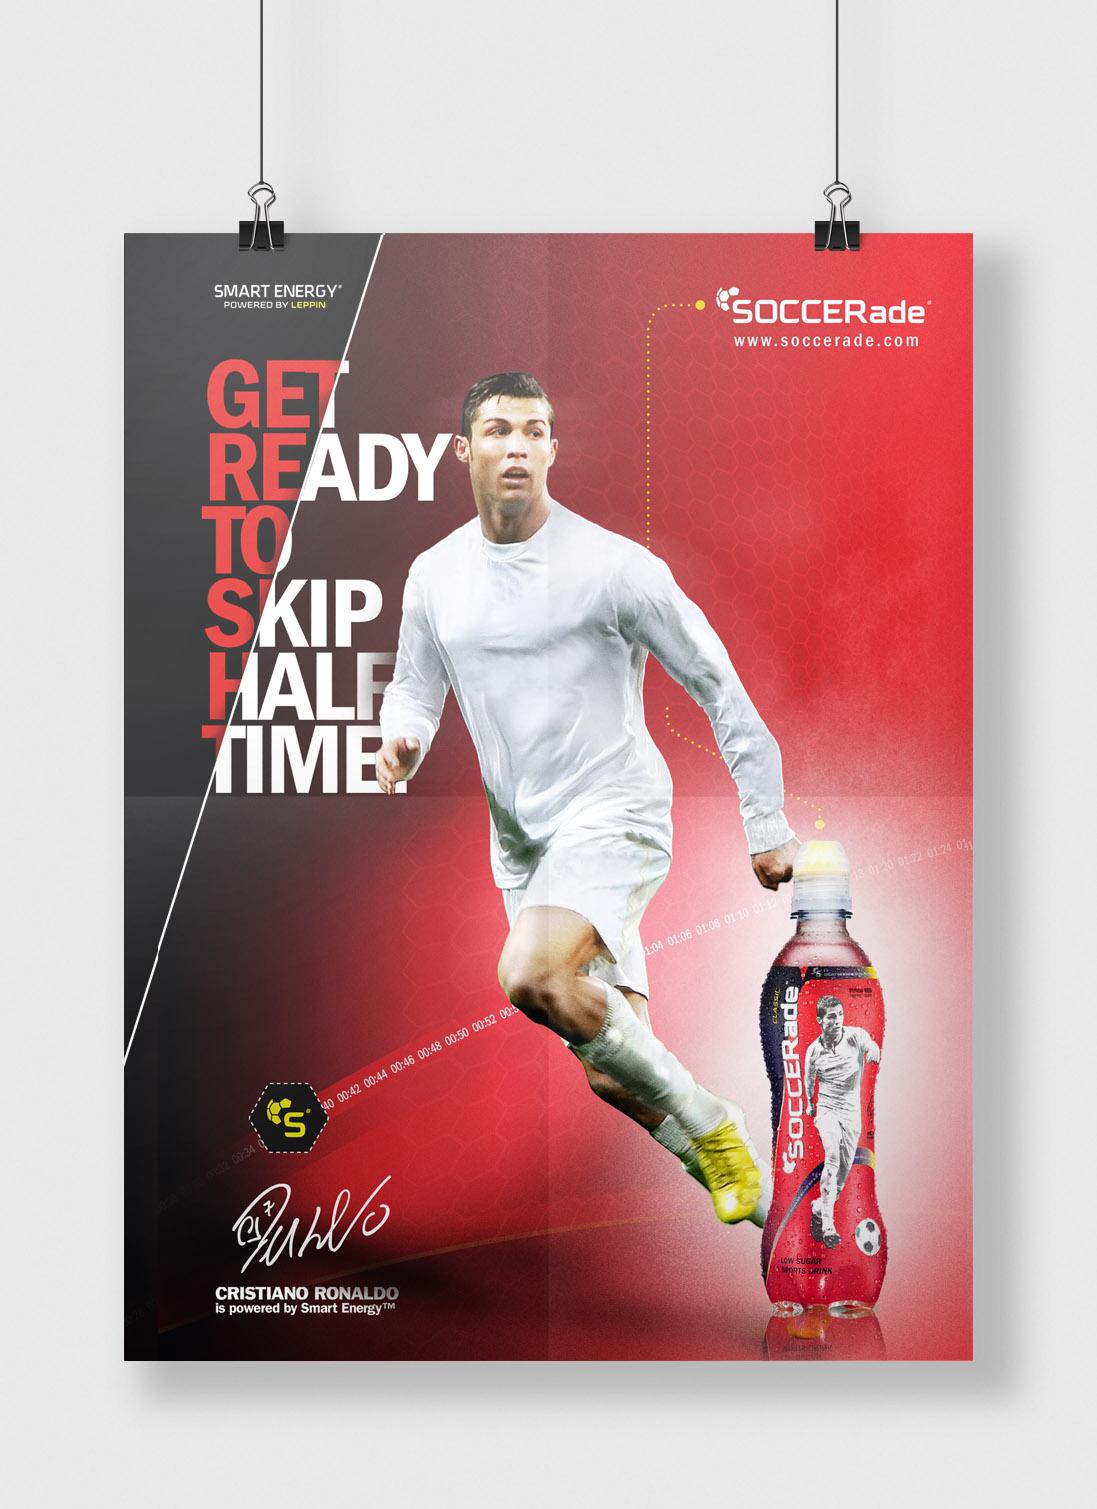 Soccerade_poster_mockup_MD9